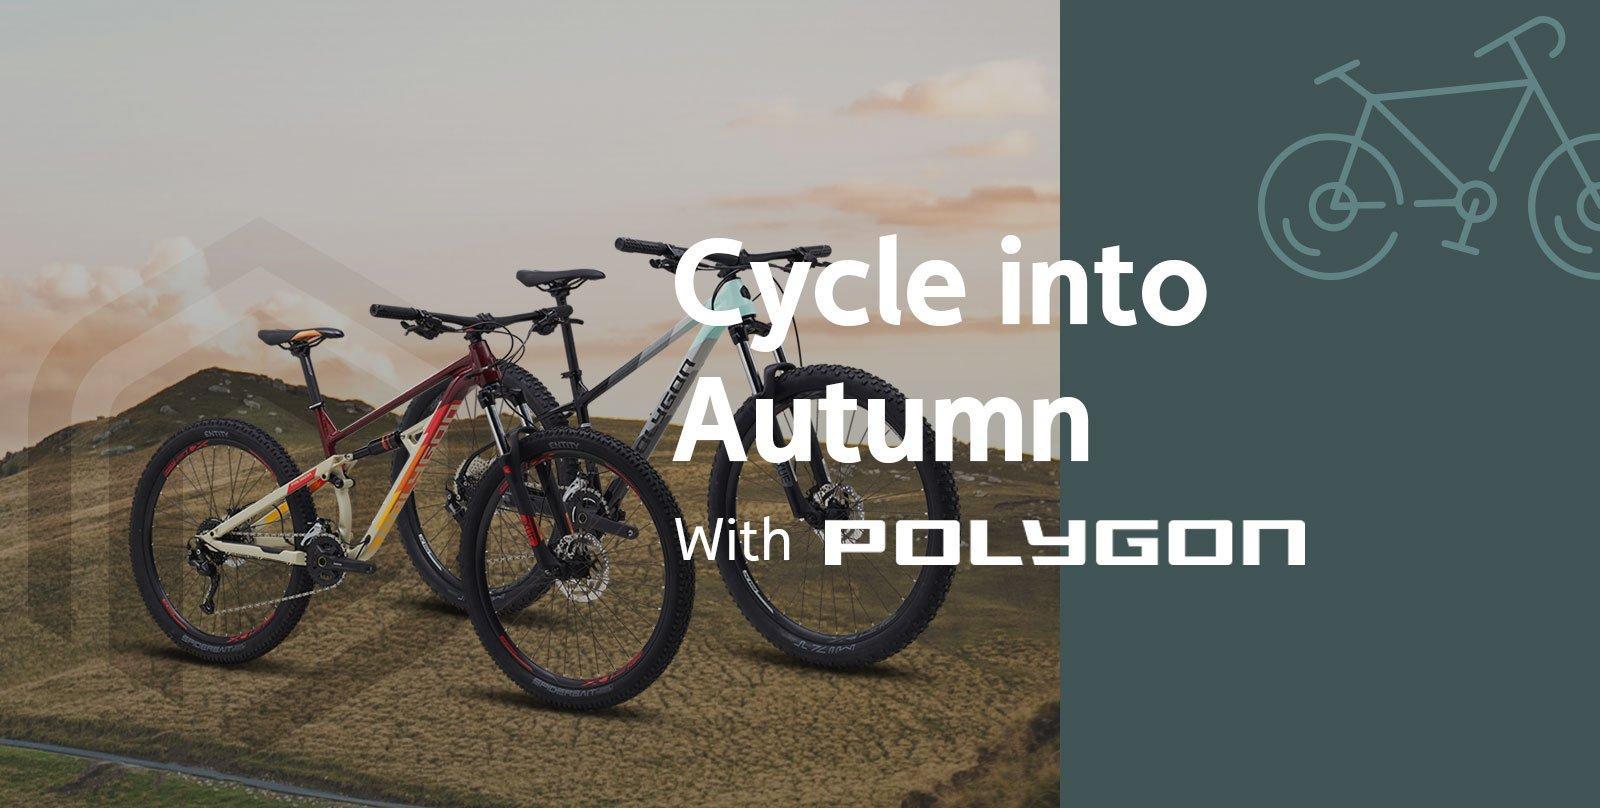 Cycle into Autumn with Polygon Bikes